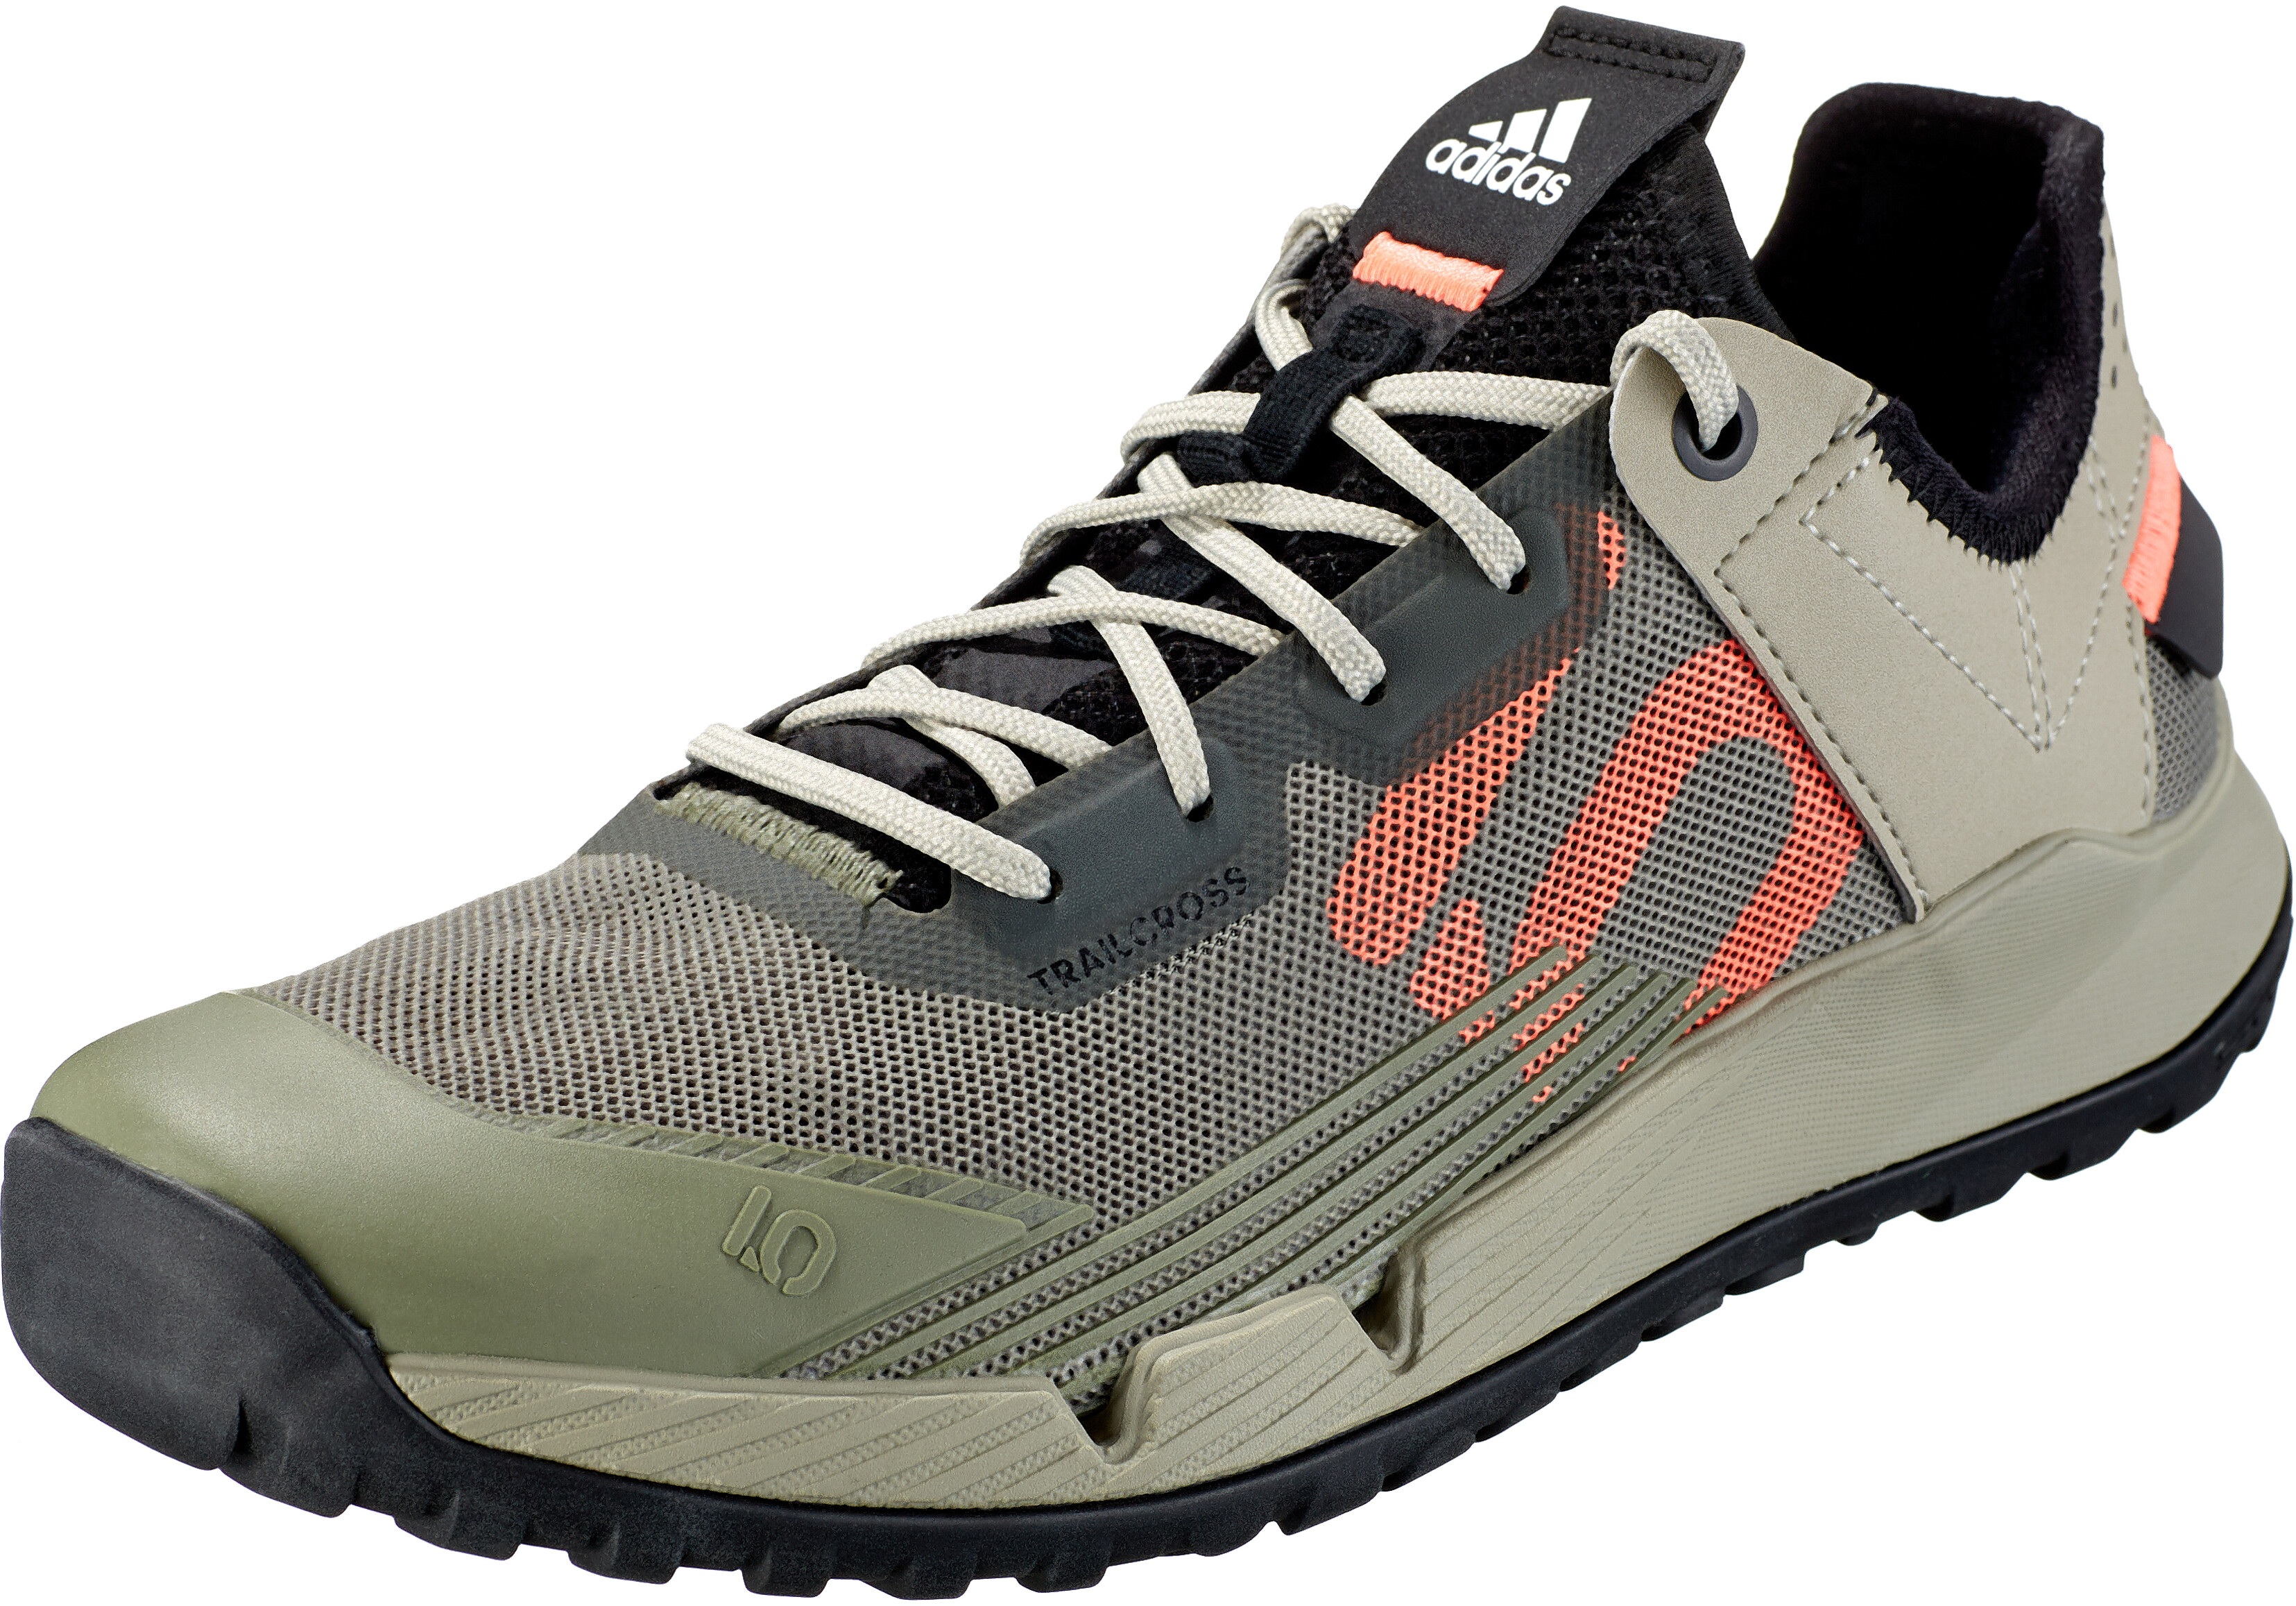 inventar Burro Playa  adidas Five Ten Trailcross LT Mountain Bike Shoes Women legacy green/signal  coral/core black at bikester.co.uk